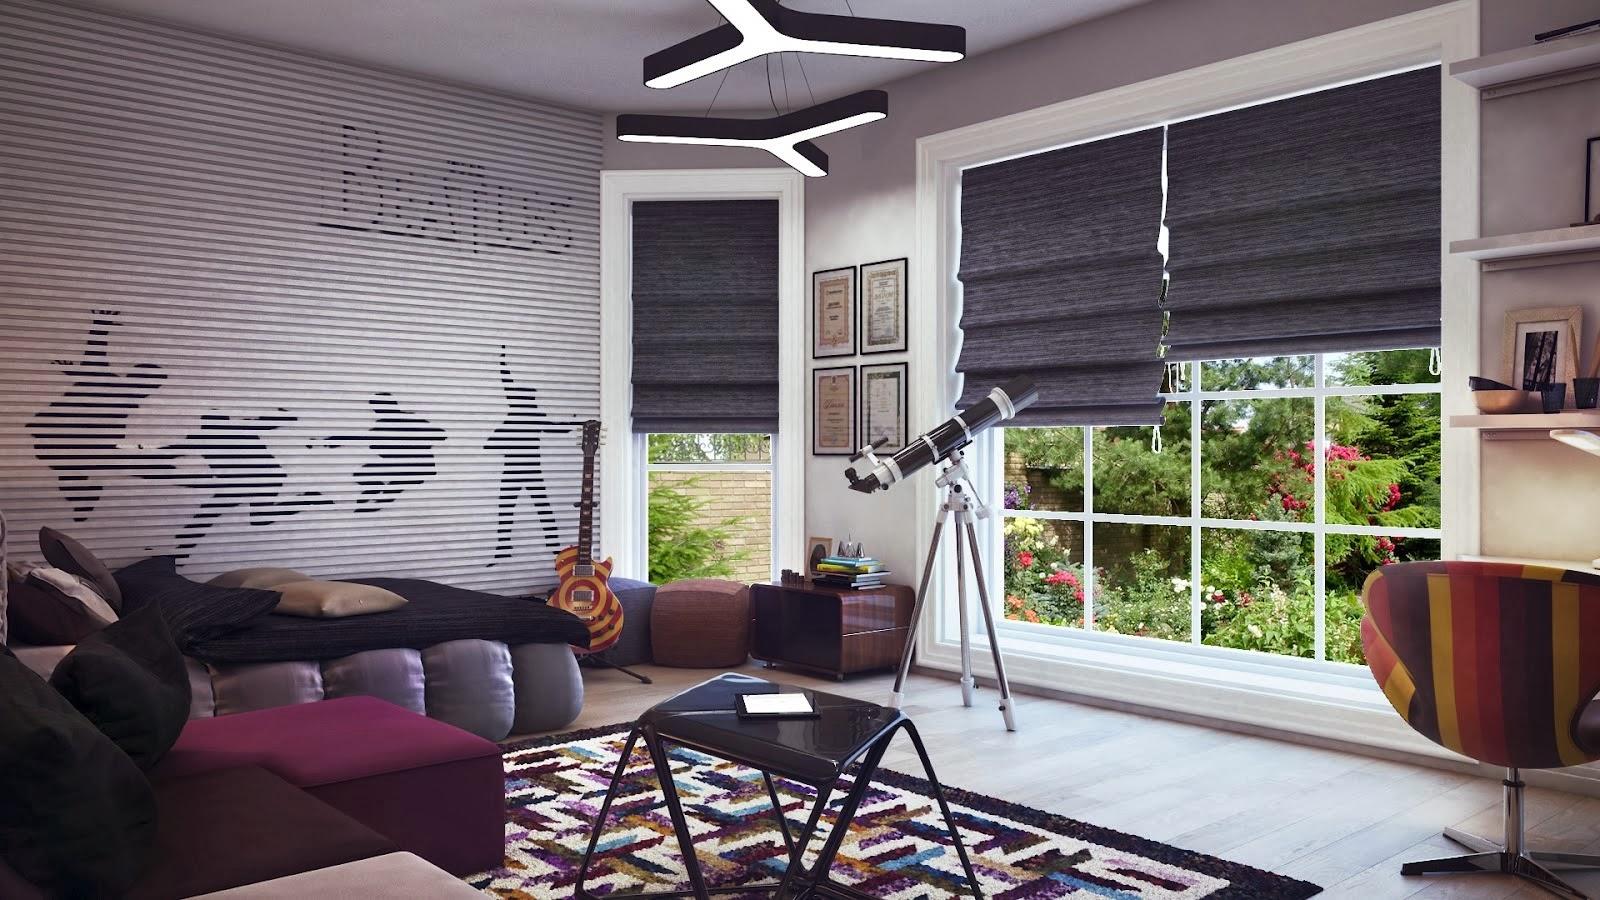 terrific boys bedroom | Terrific Young Teenager's Rooms | Teen Room Designs